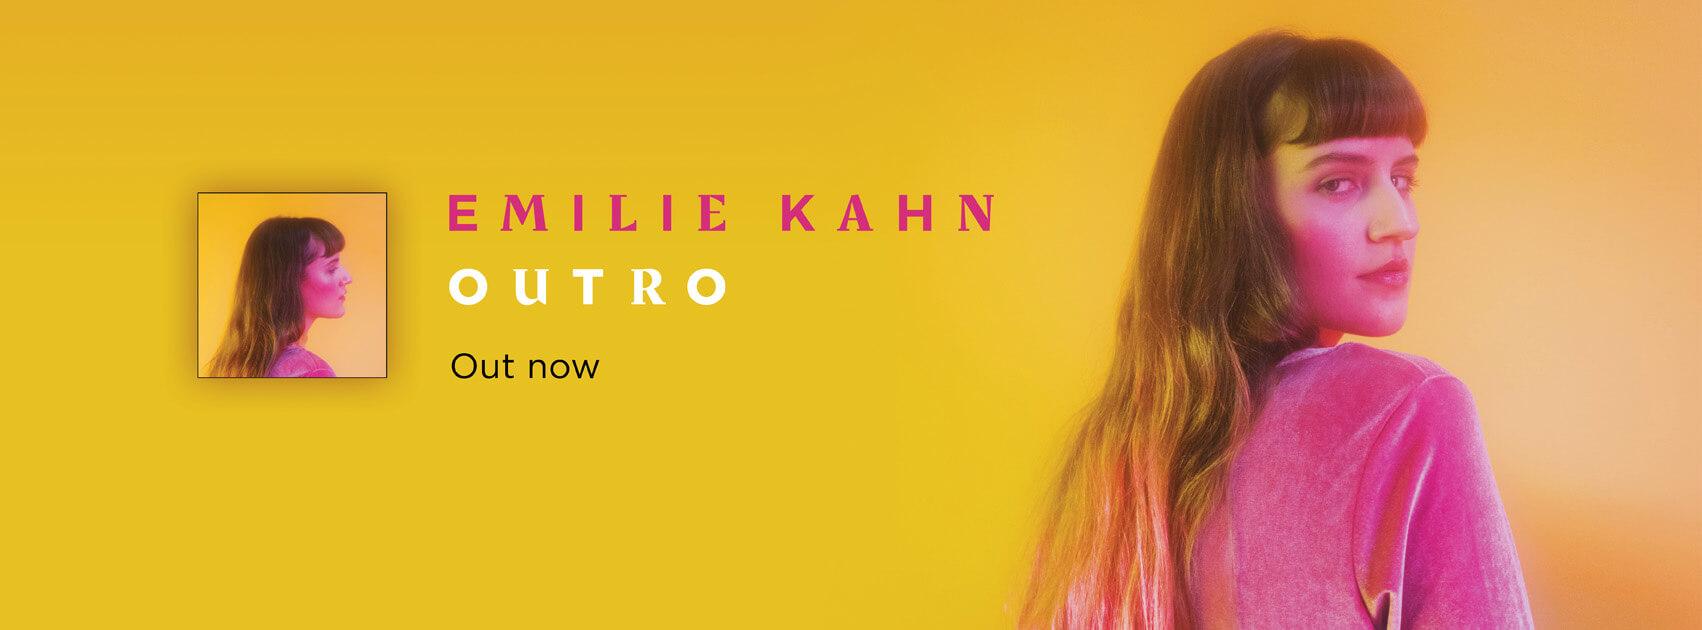 Emilie Kahn Outro out now